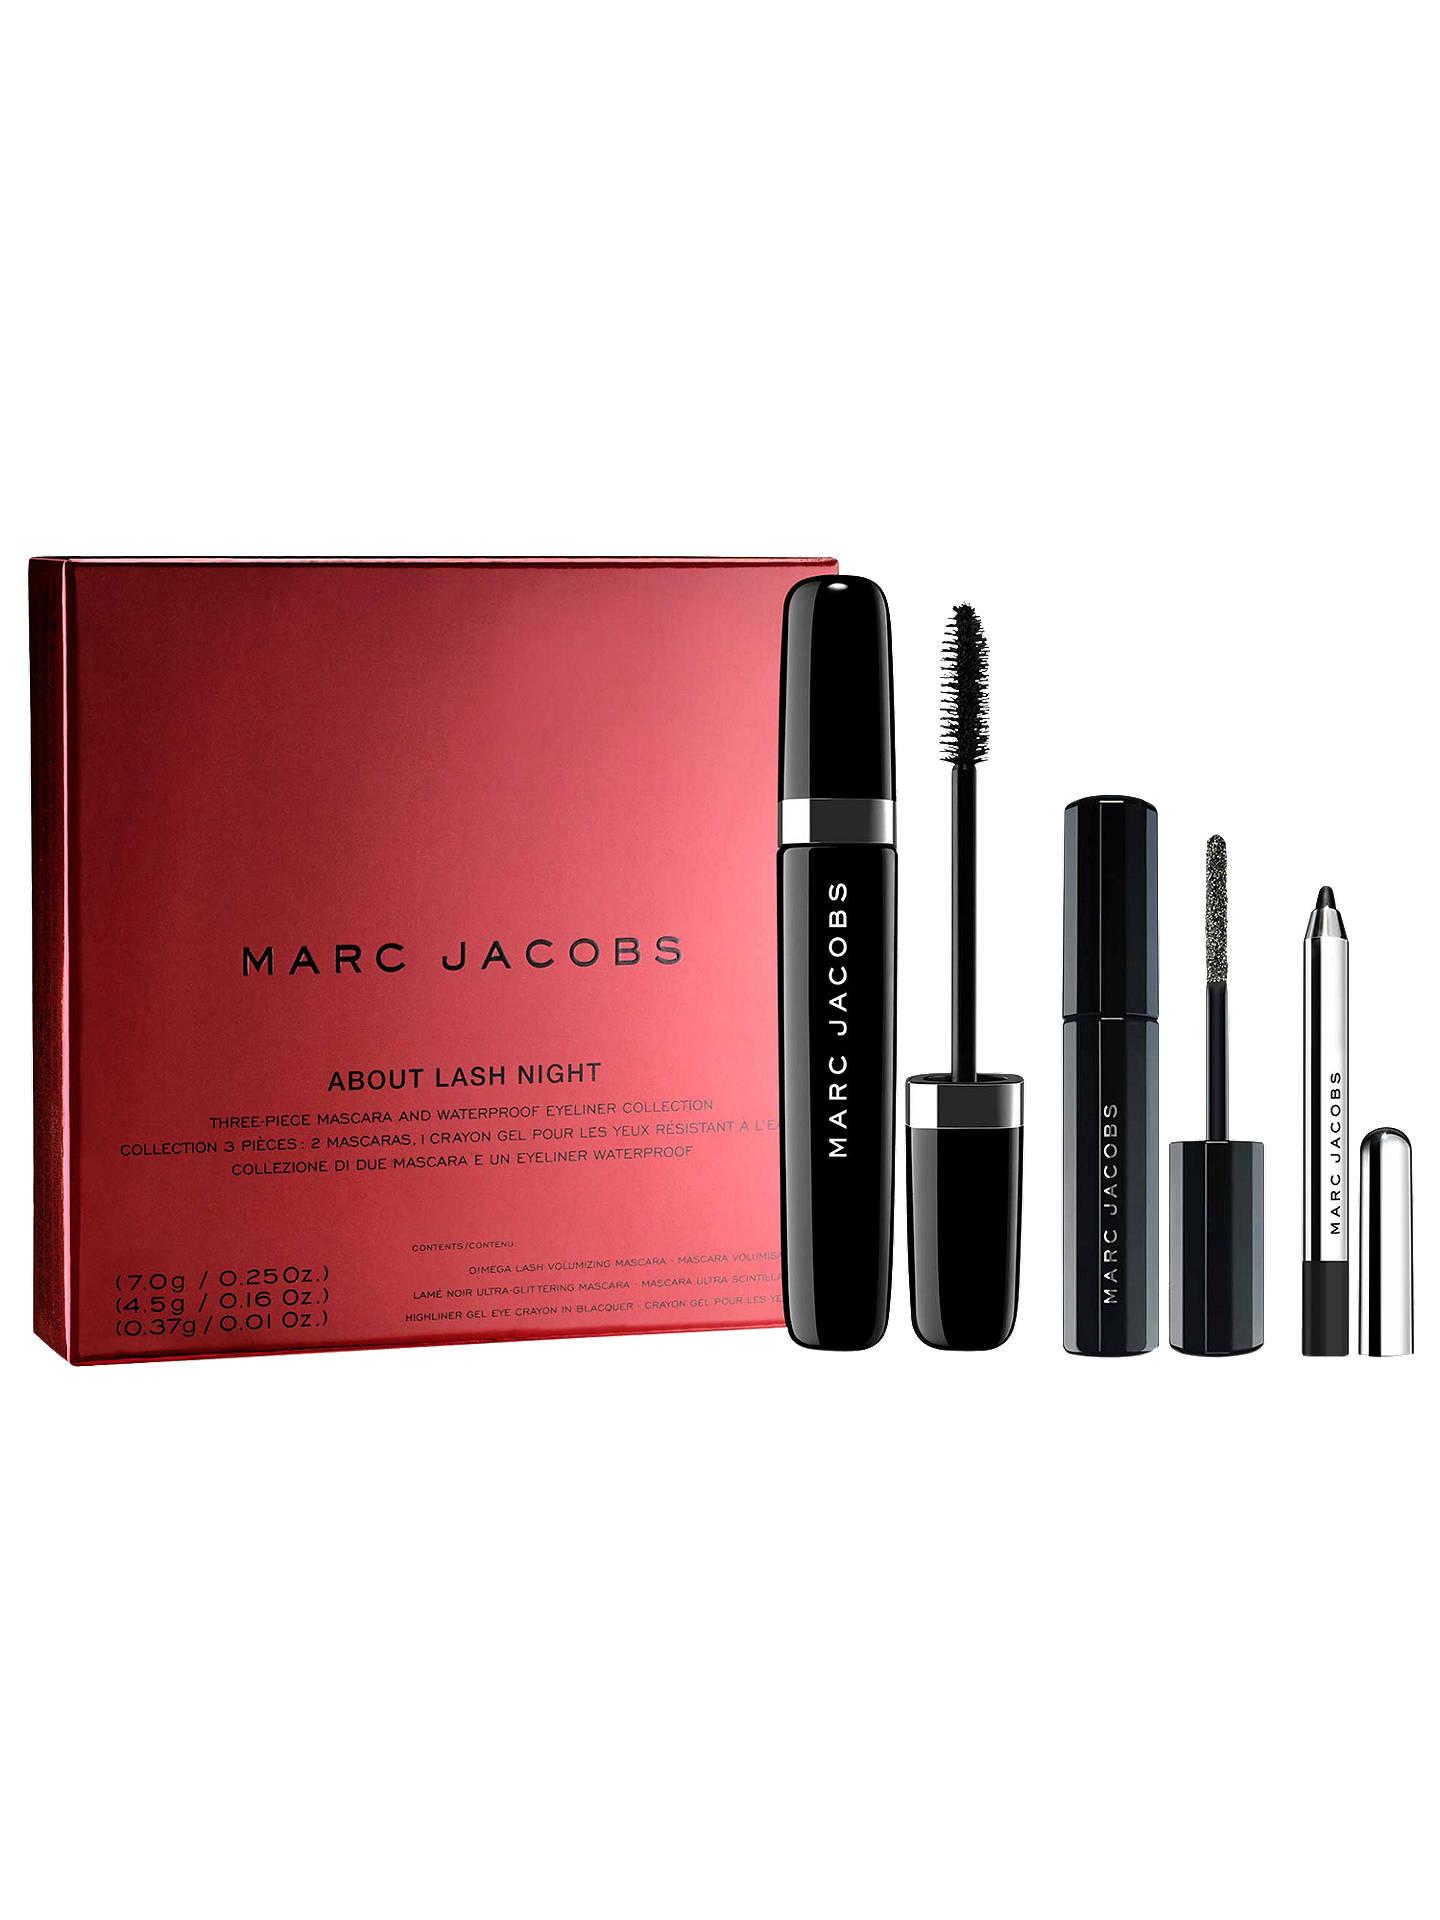 Marc Jacobs About Lash Night Makeup